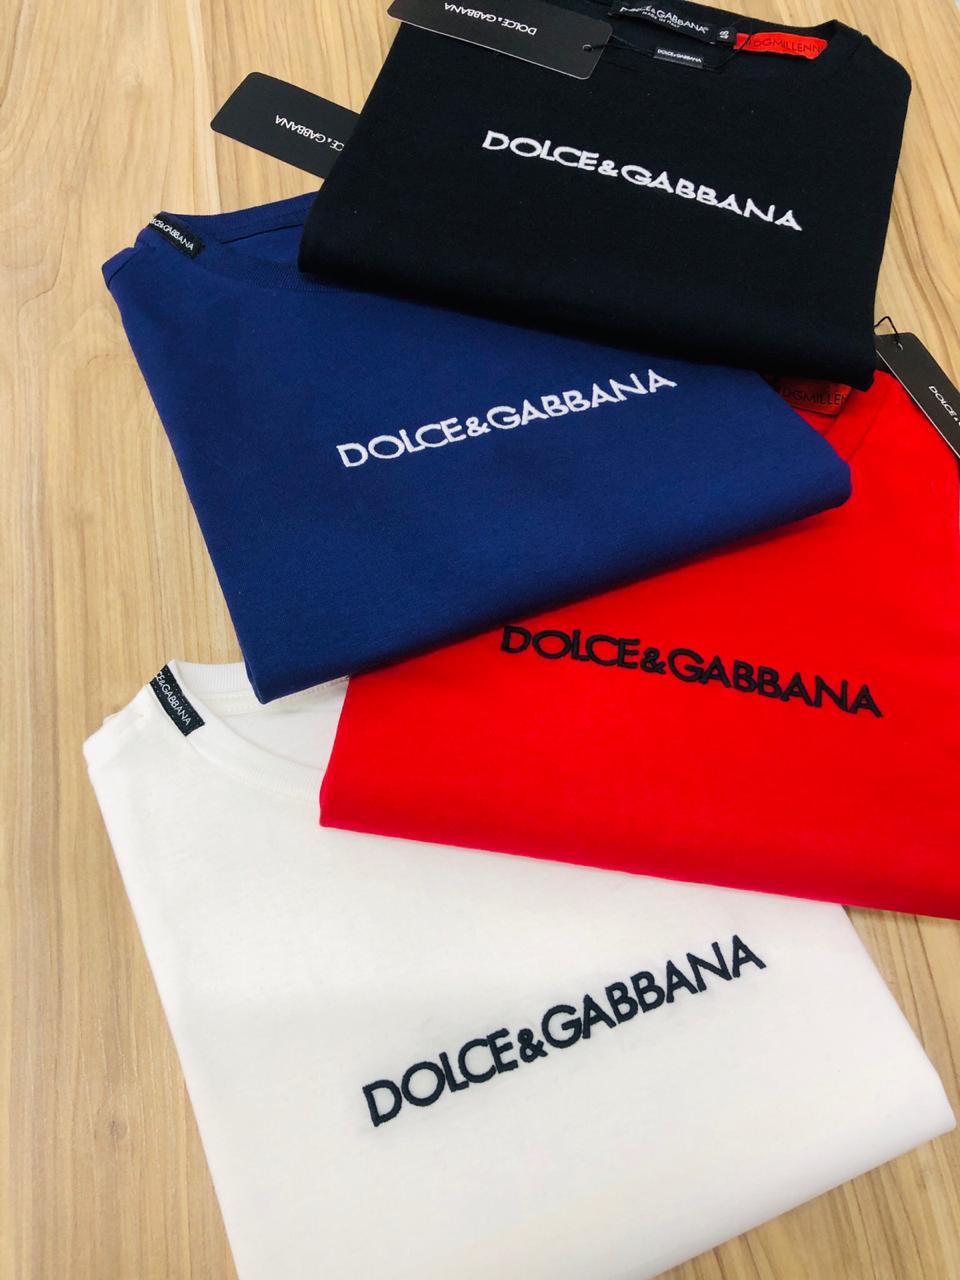 Camiseta Dolce & Gabbana Diferenciada (cada)